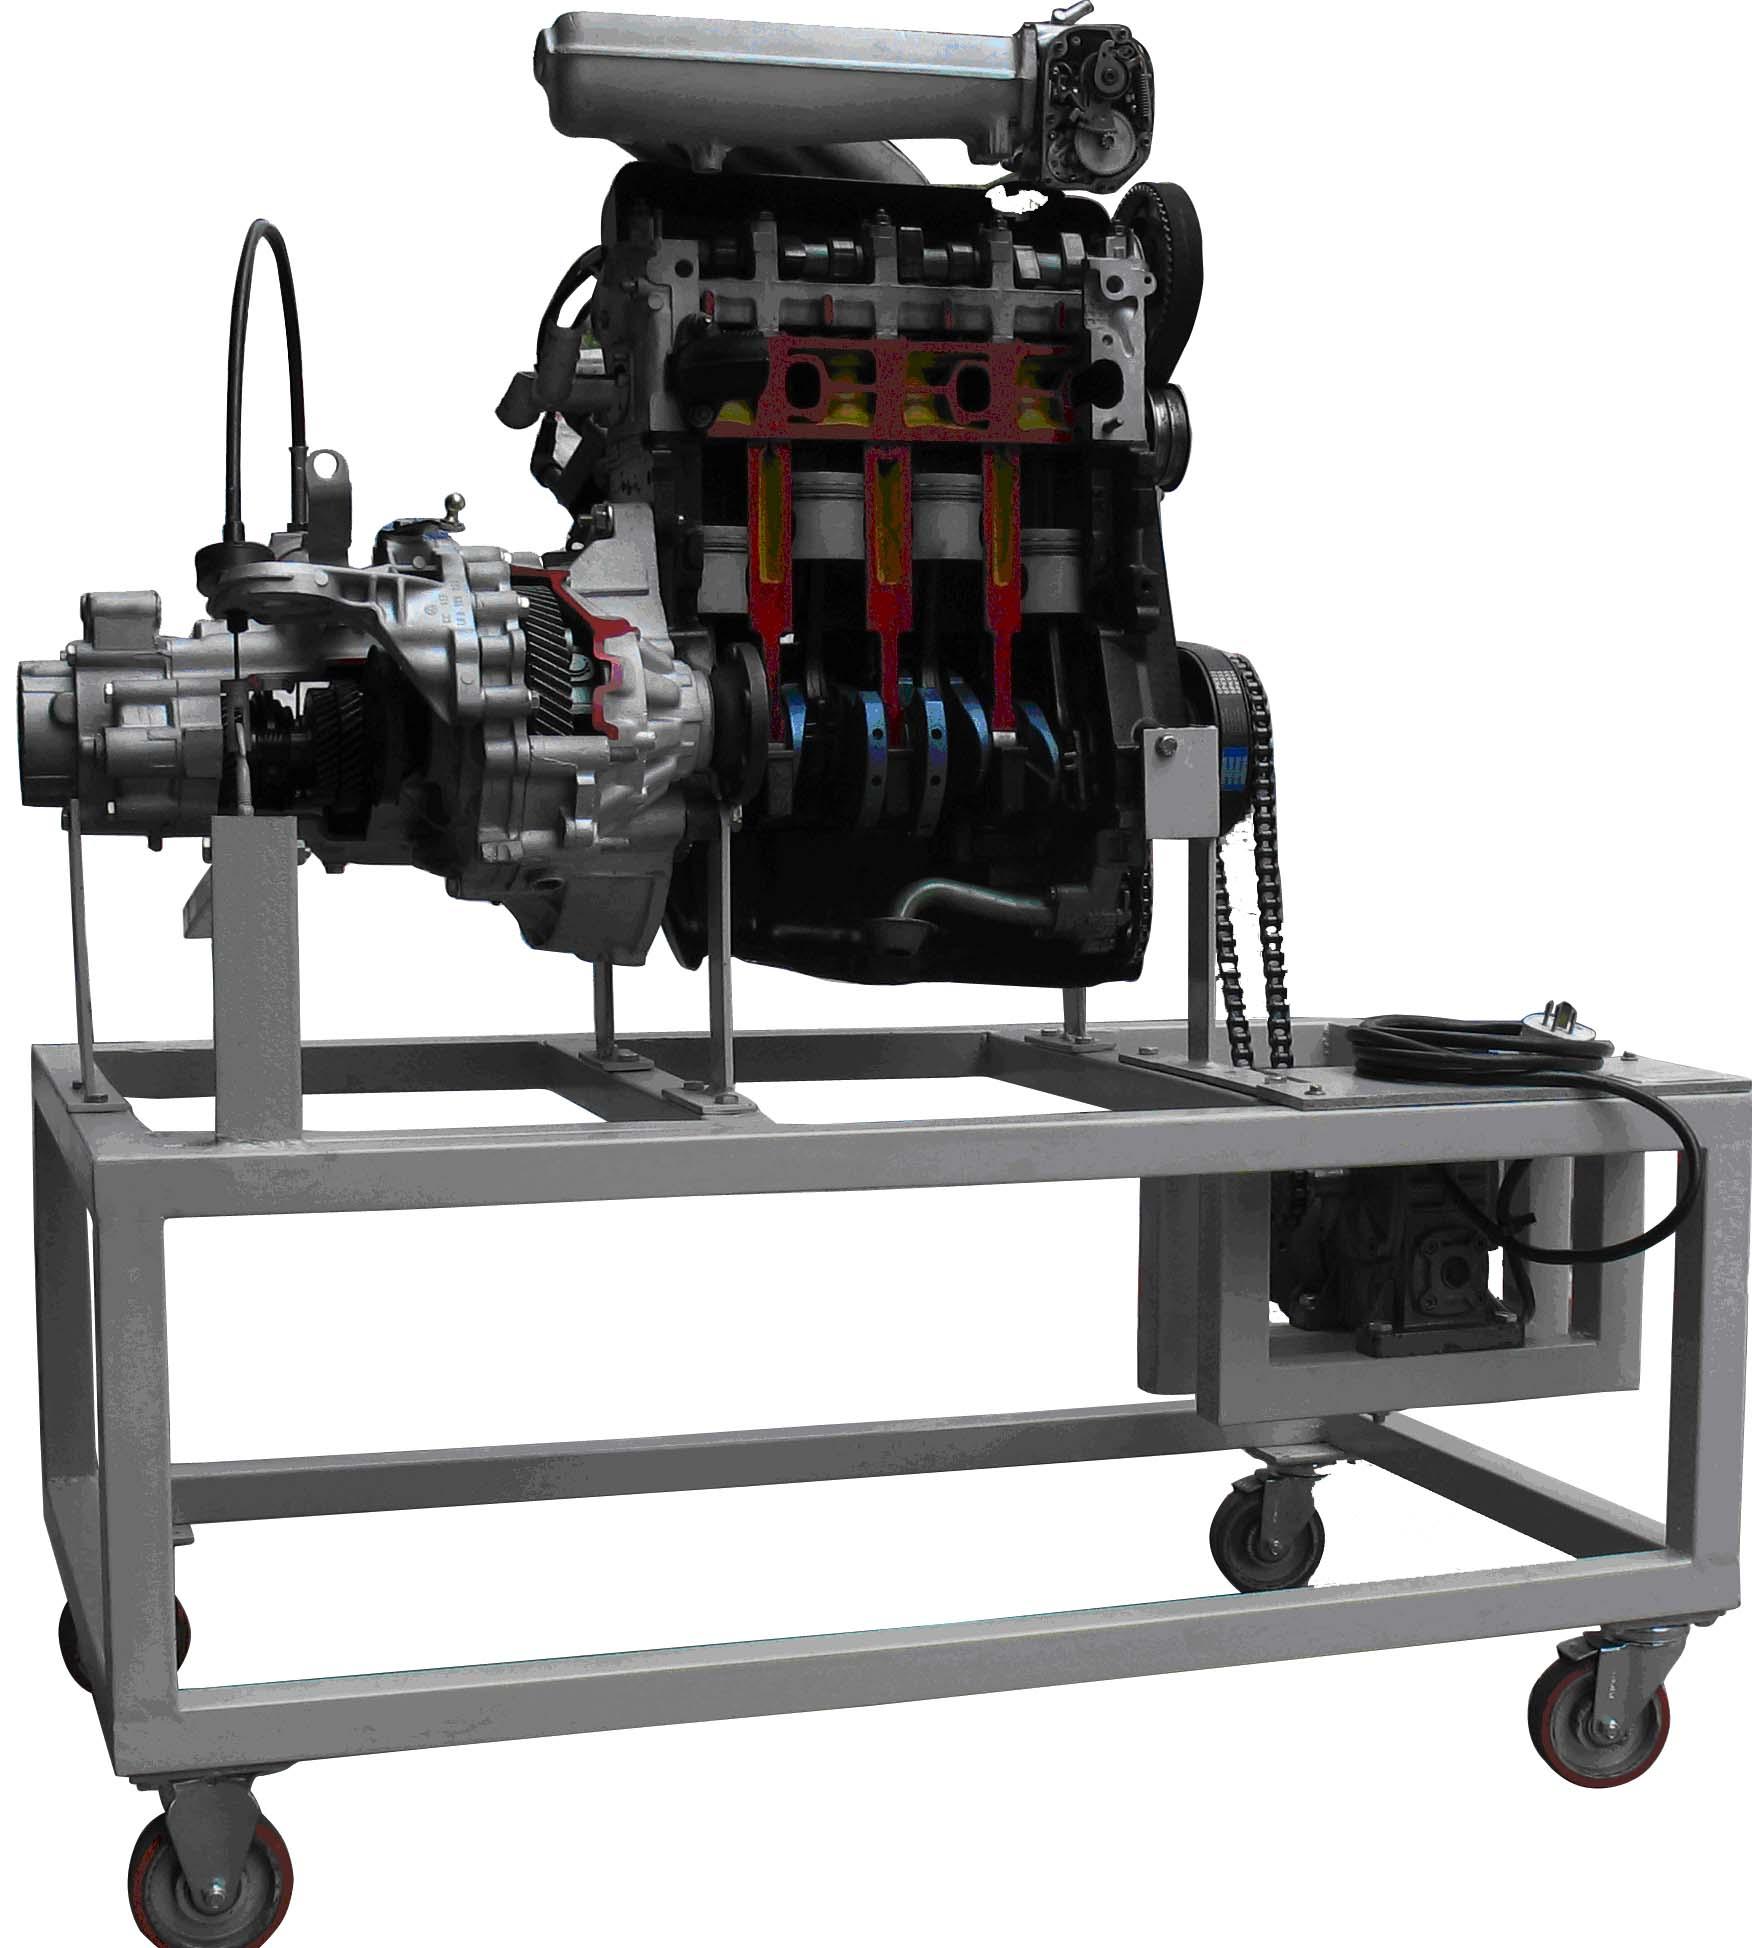 yuy-jp15汽车发动机与变速器解剖模型